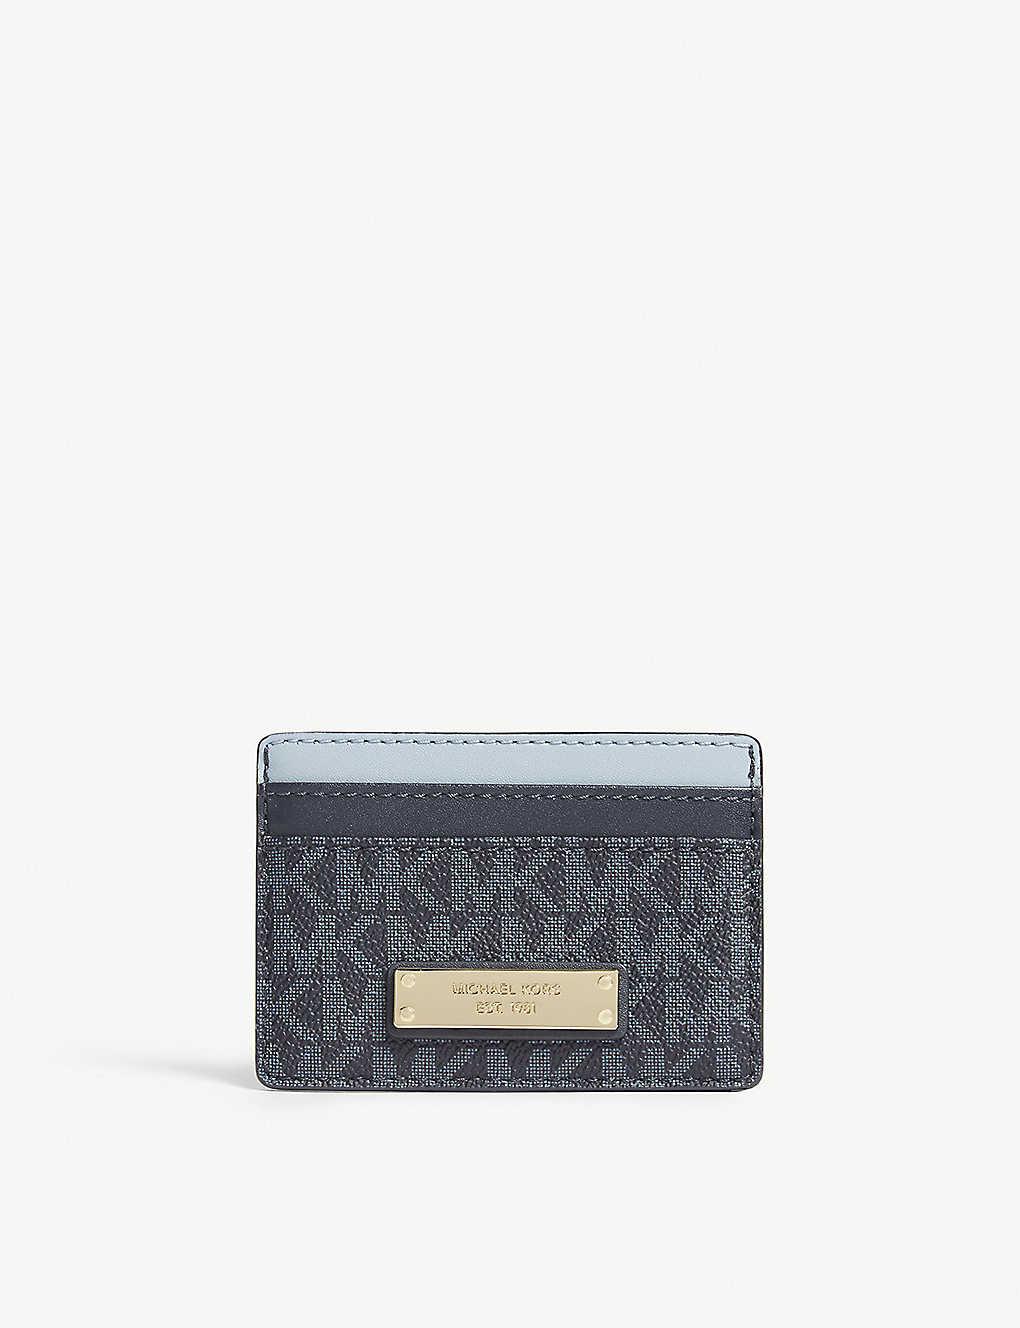 dff3a81f609c MICHAEL MICHAEL KORS - Money Pieces logo leather card holder ...